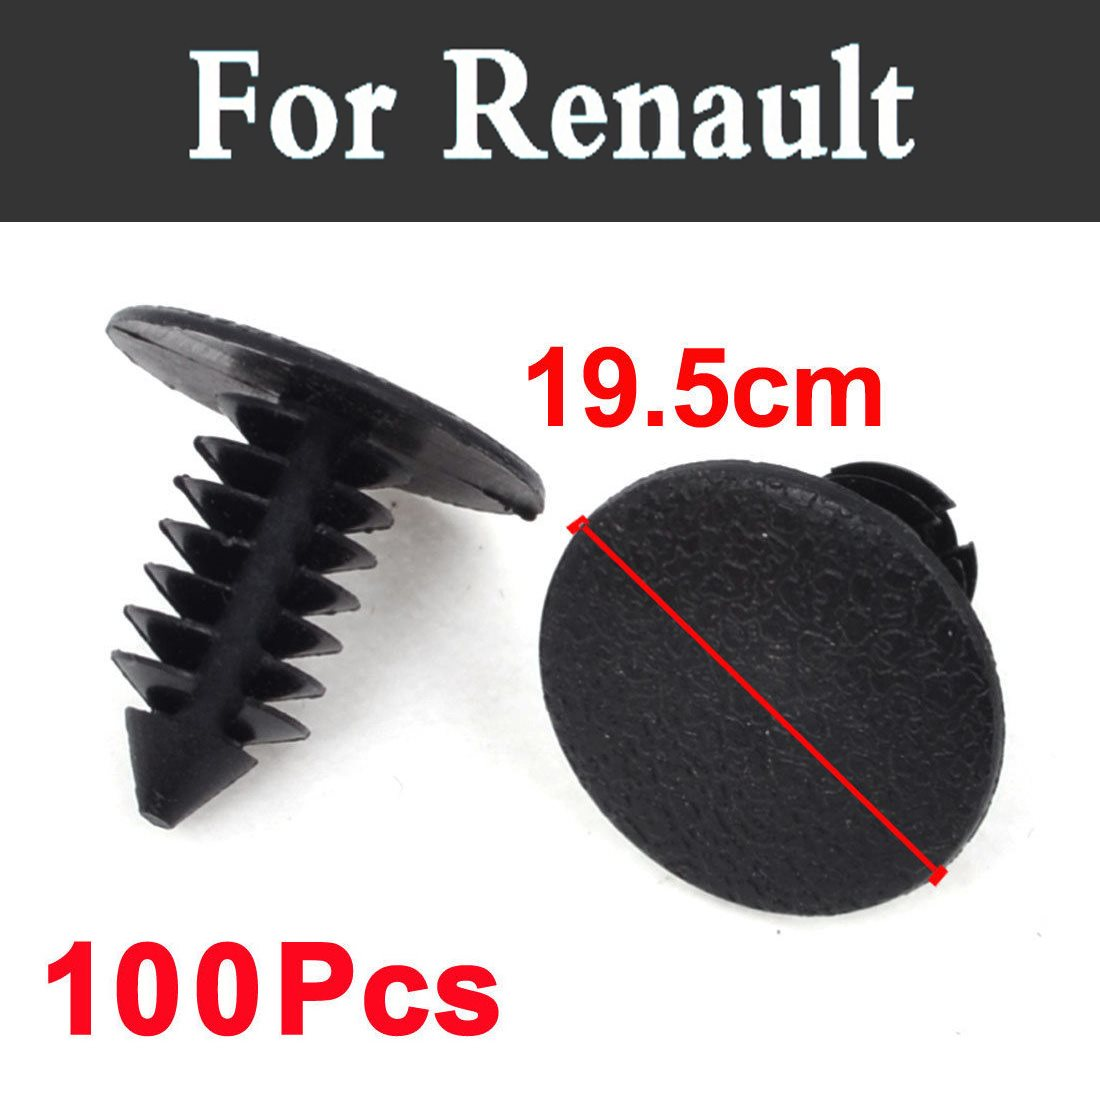 100pcs Auto Fastener Nylon Car Clips Fender Bumper Shield Screw For Renault Sandero Symbol Talisman Twingo Twizy Vel Satis Wind